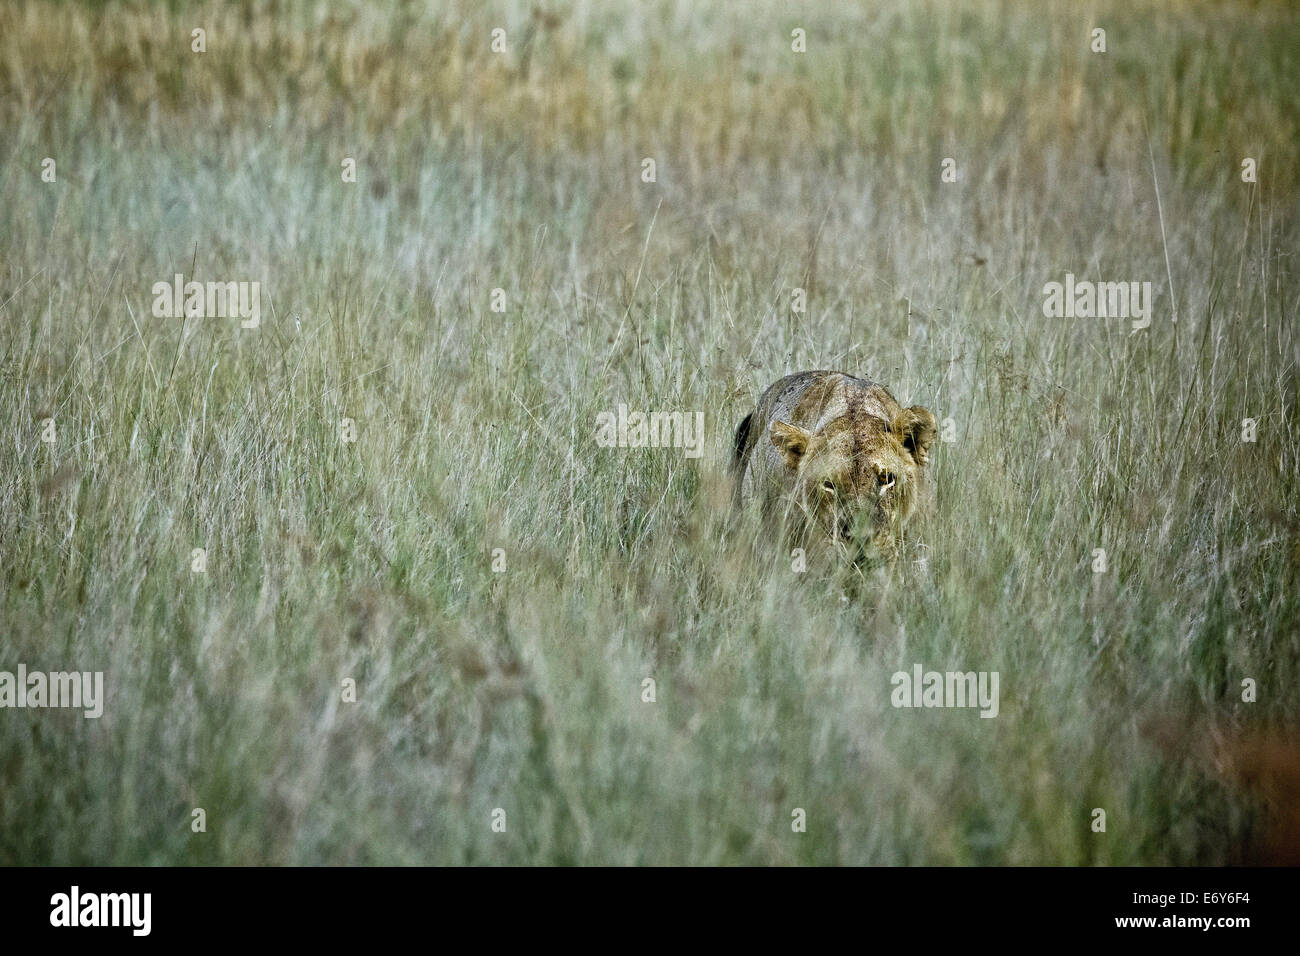 La lionne se cachant dans l'herbe de la savane, Okavango Delta, Botswana, Africa Photo Stock